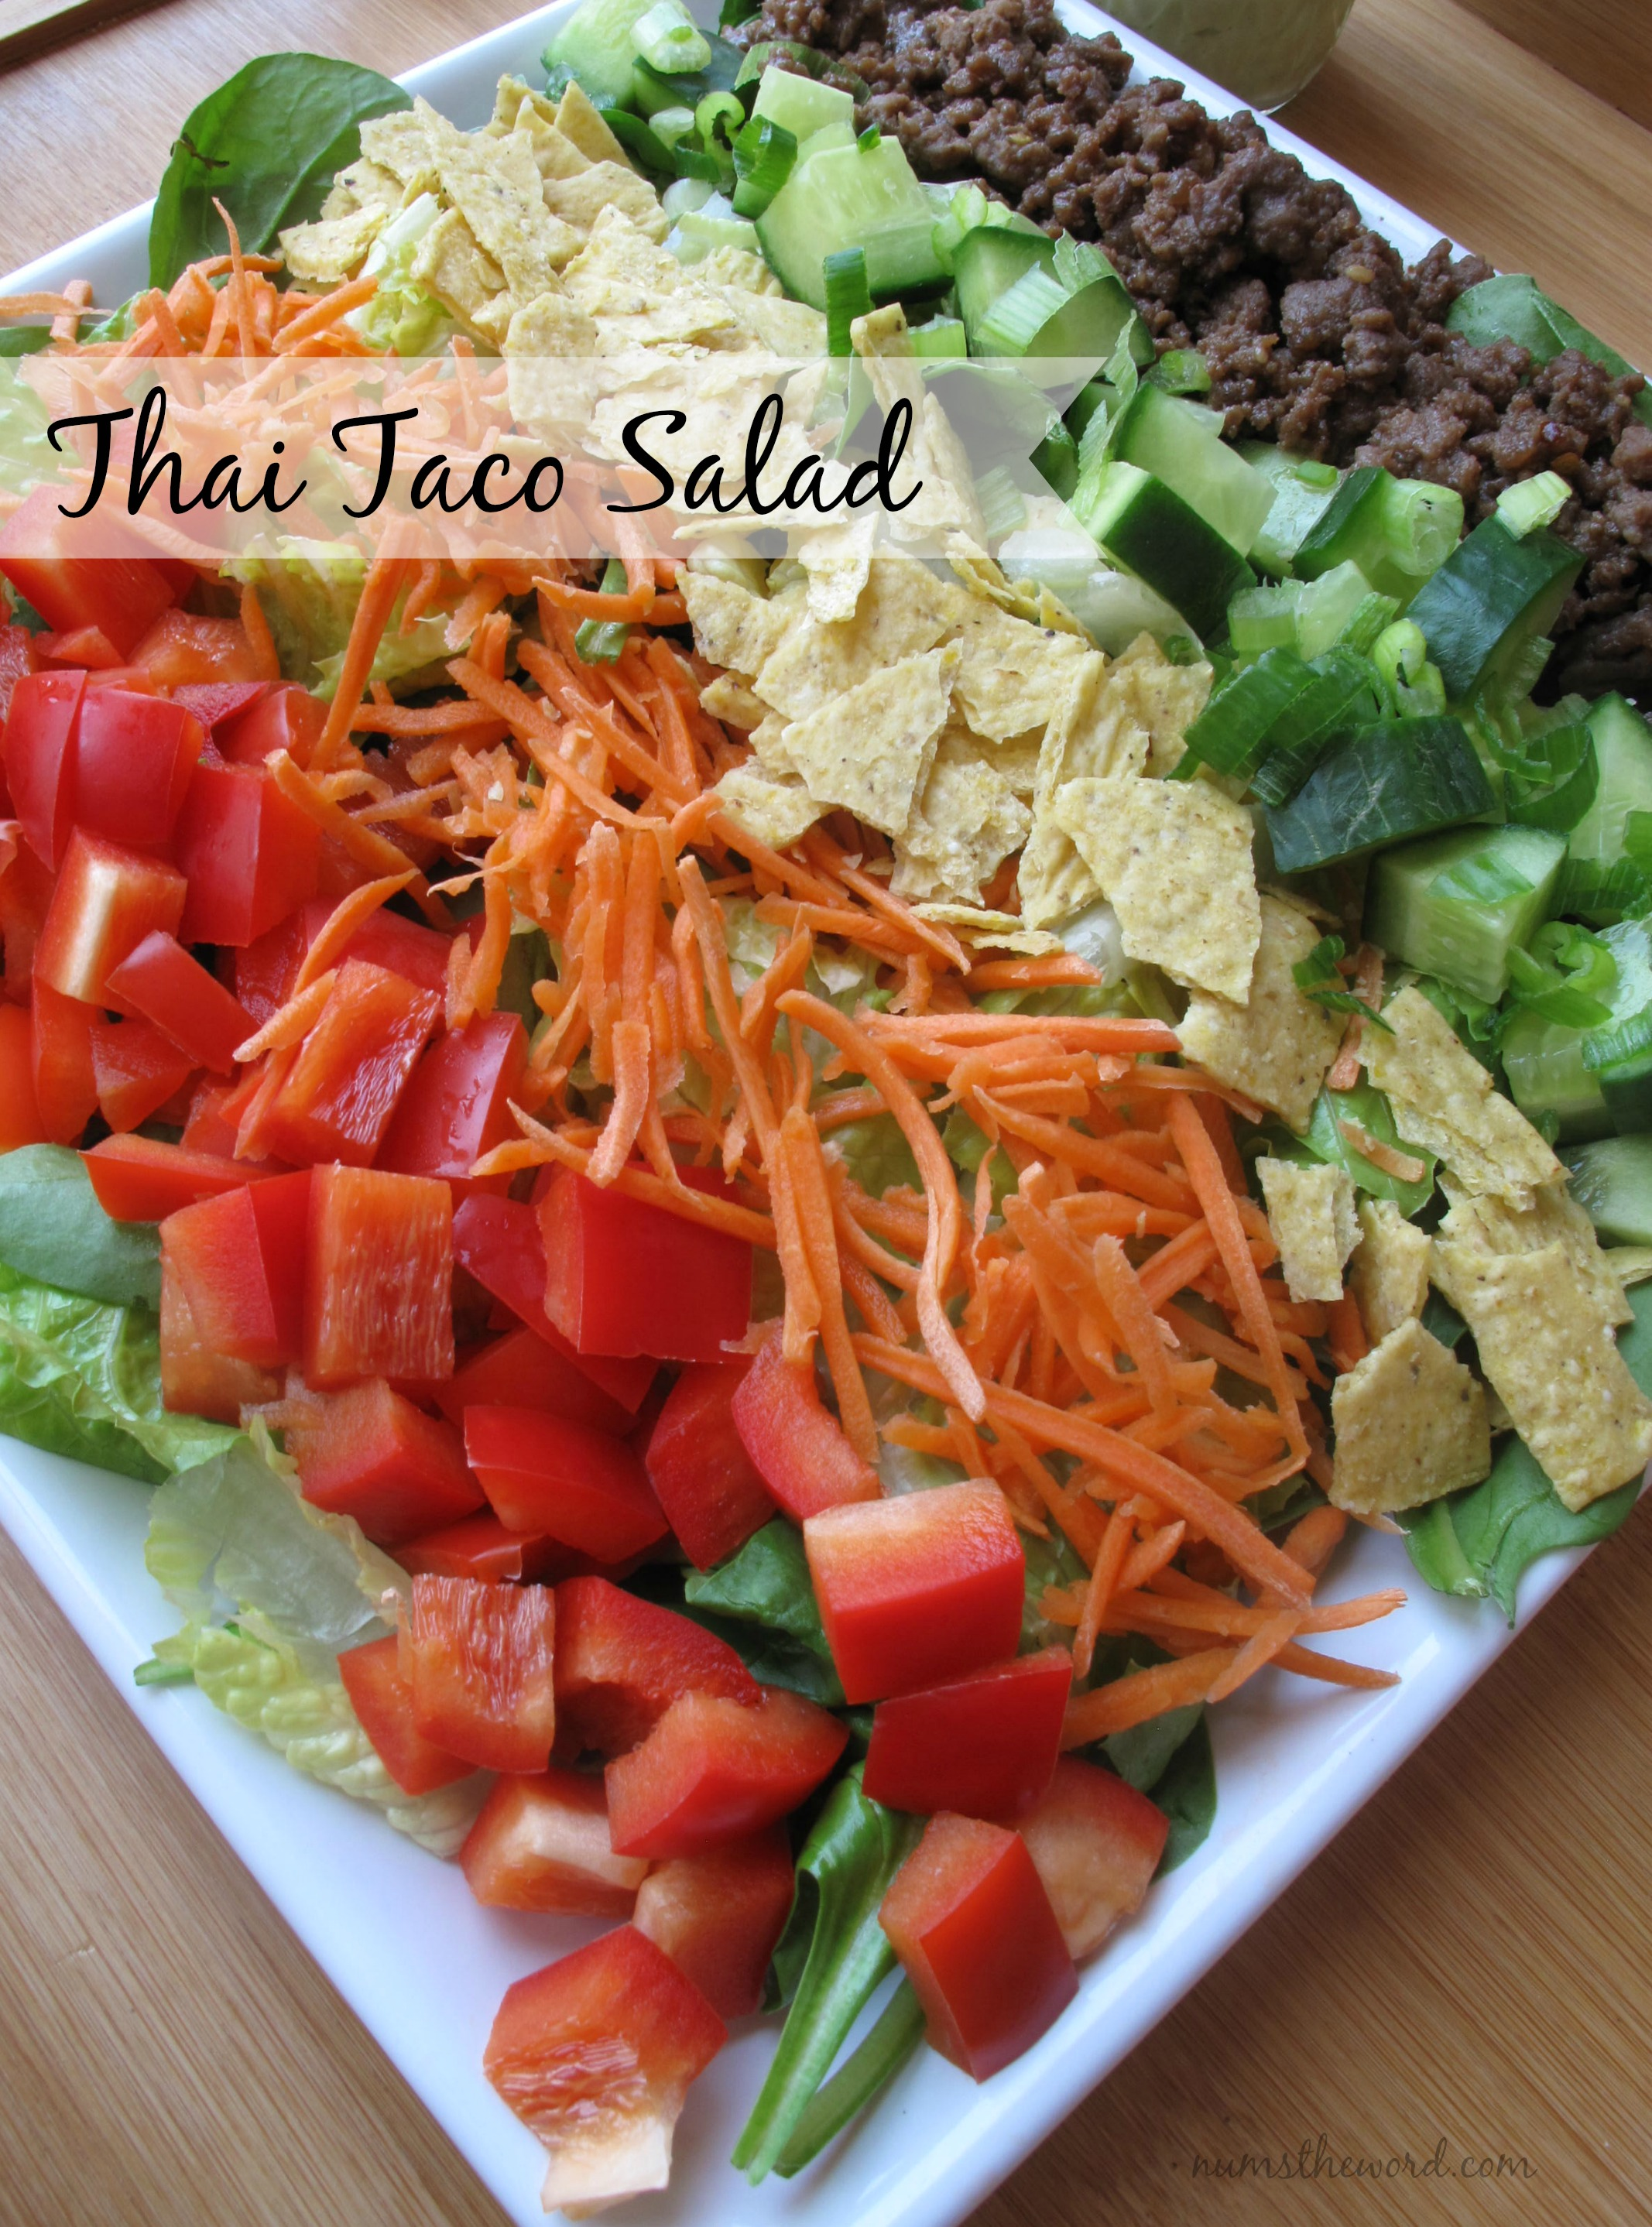 Thai Taco Salad